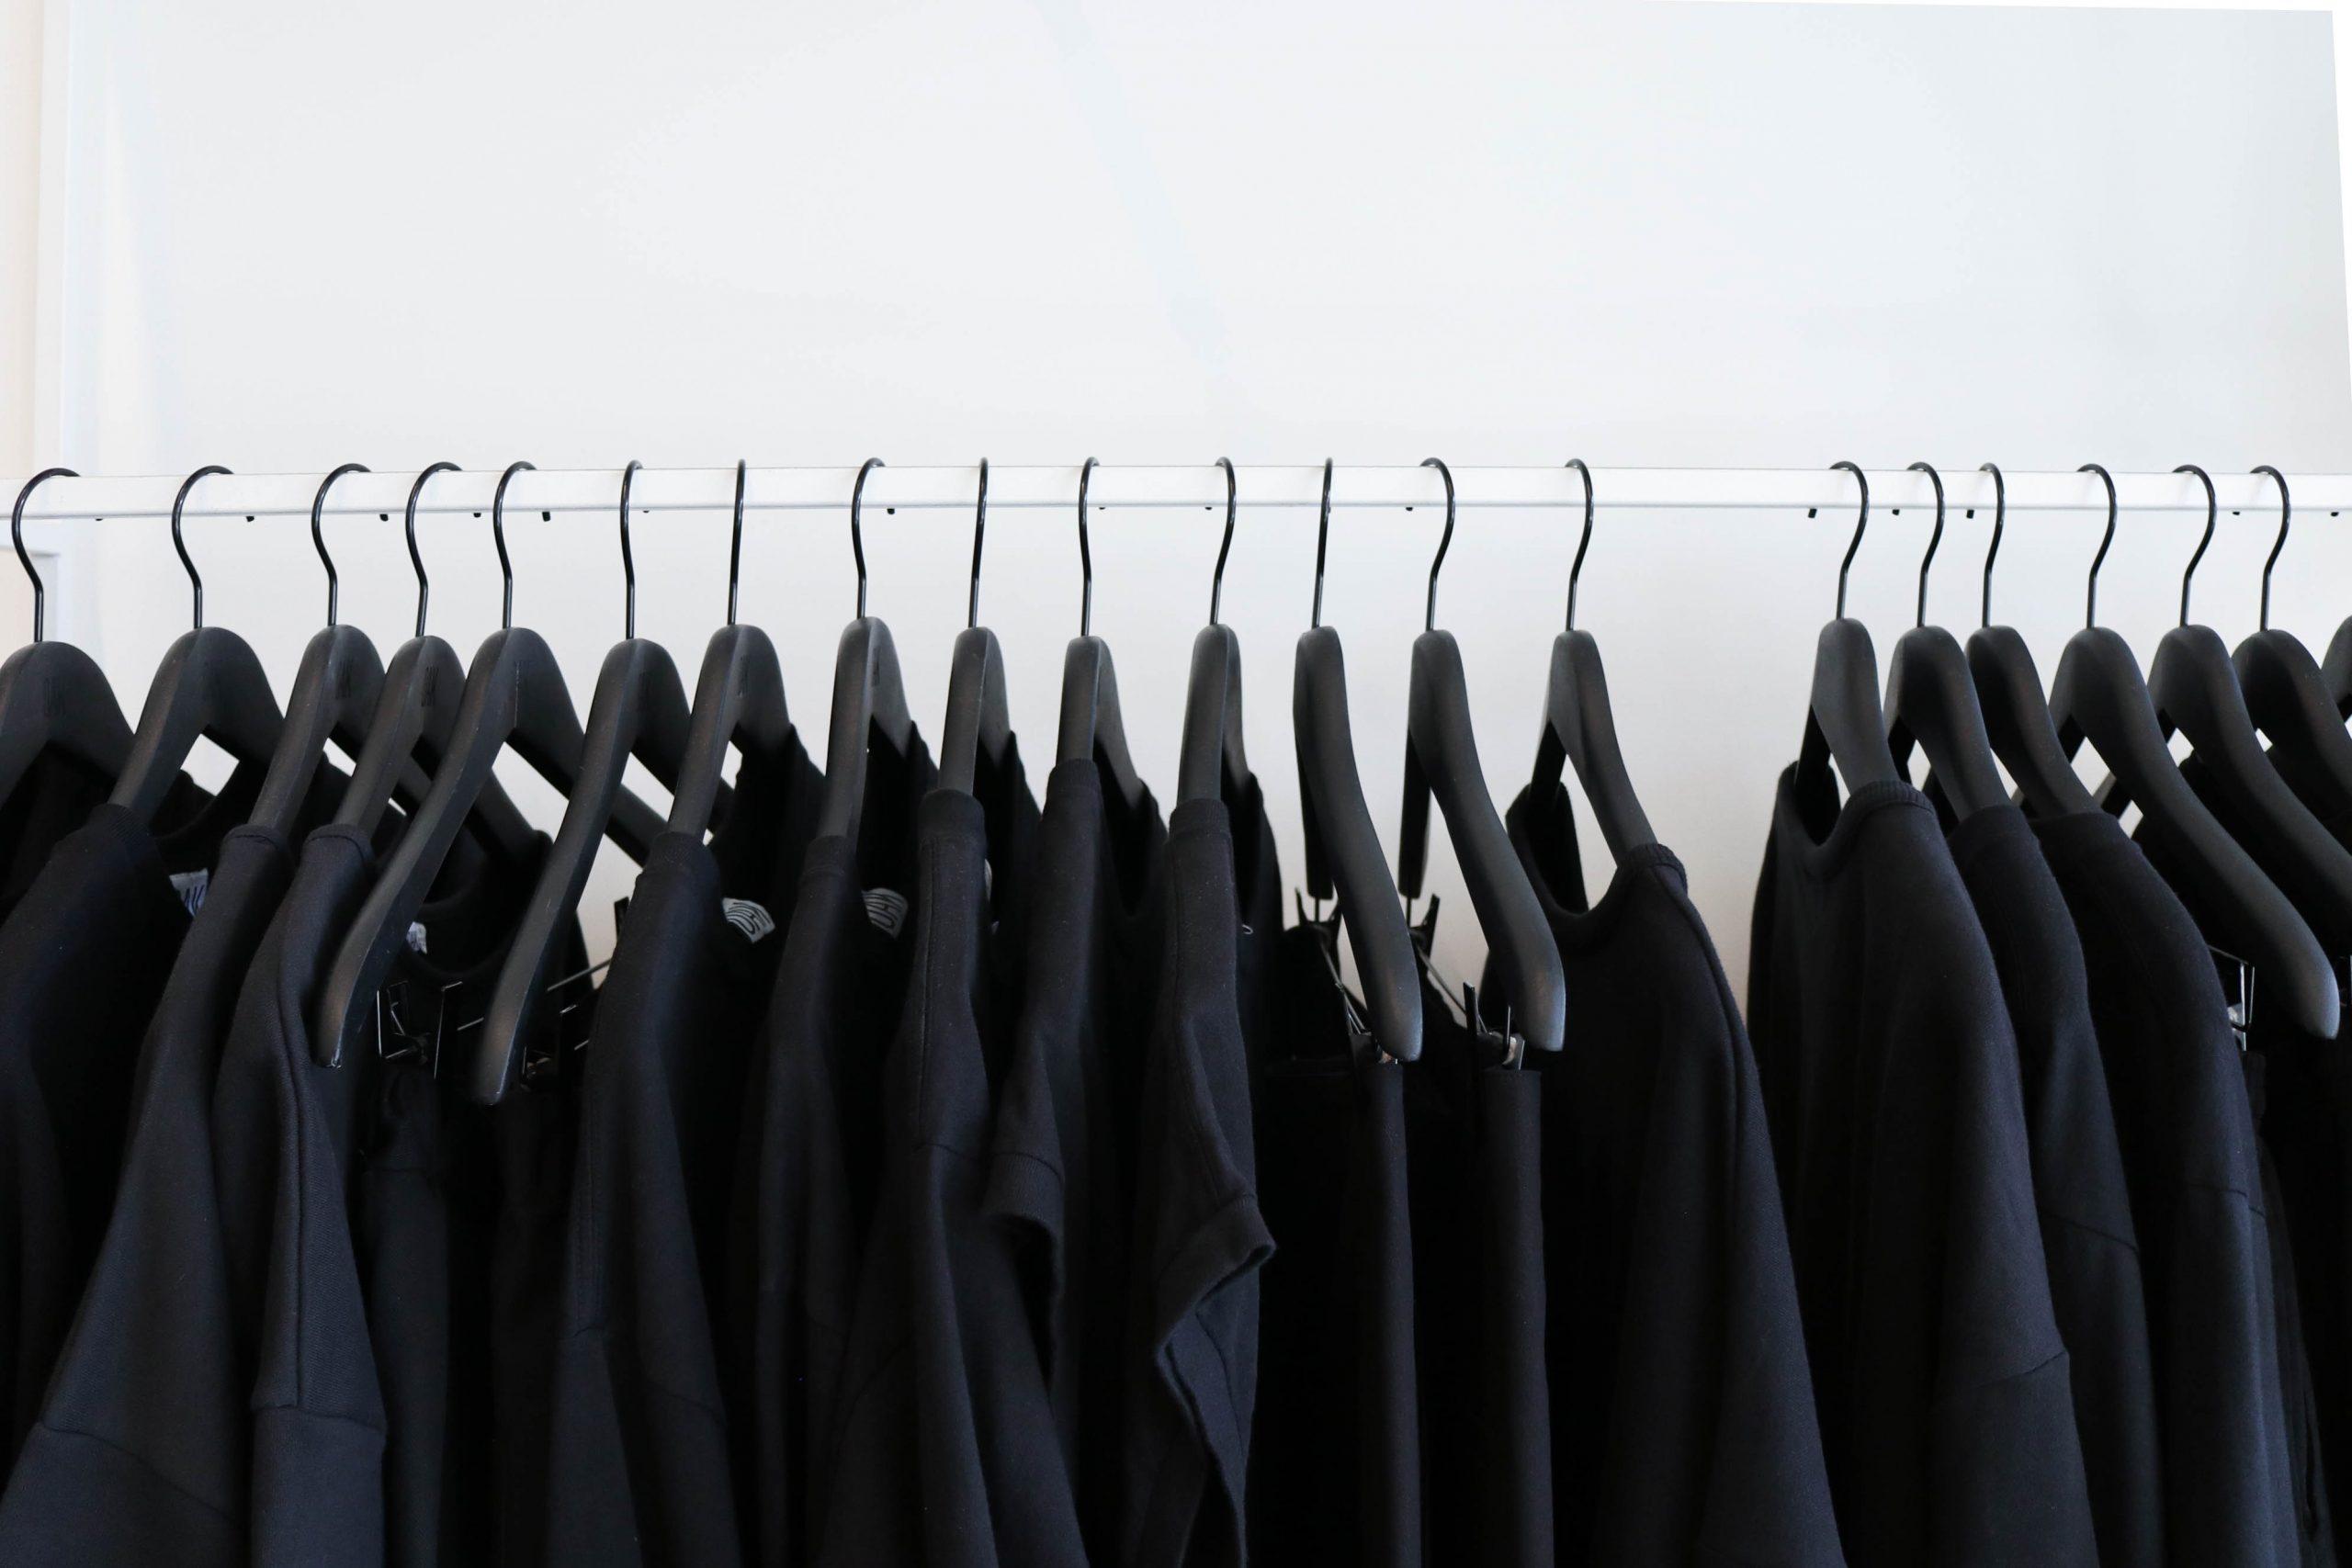 t-shirts, sorte bluser (Foto: Unsplash)